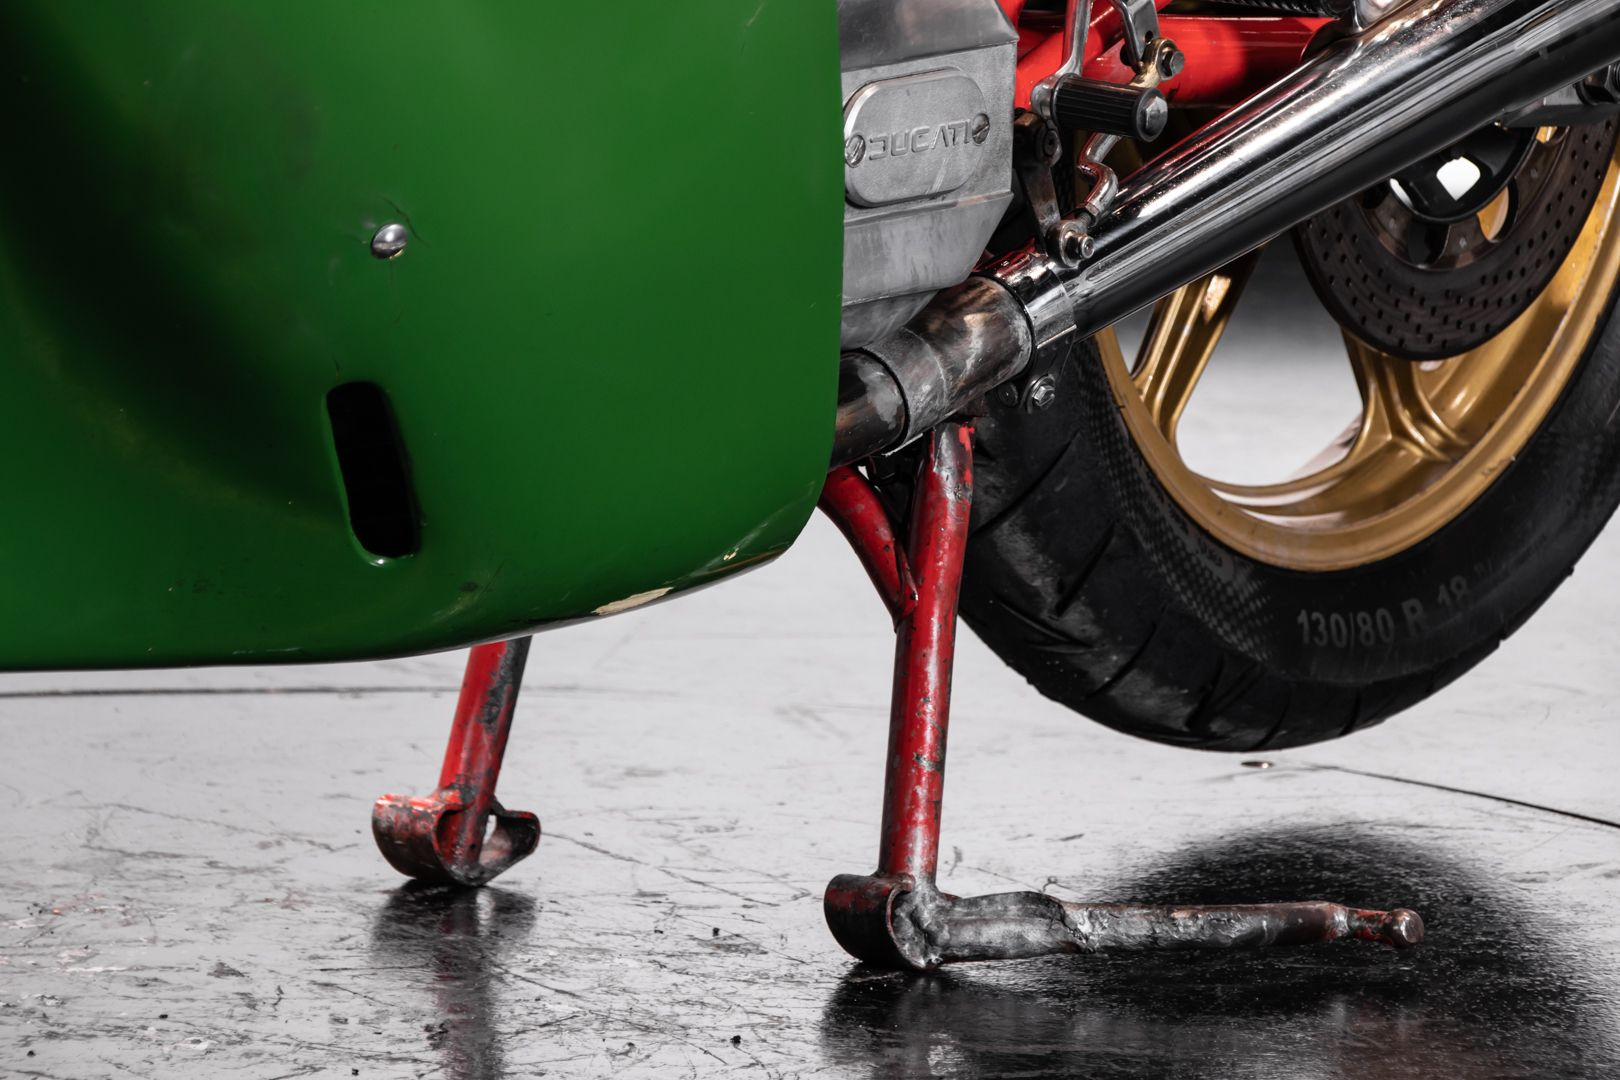 1983 Ducati 900 Mike Hailwood Replica 71412